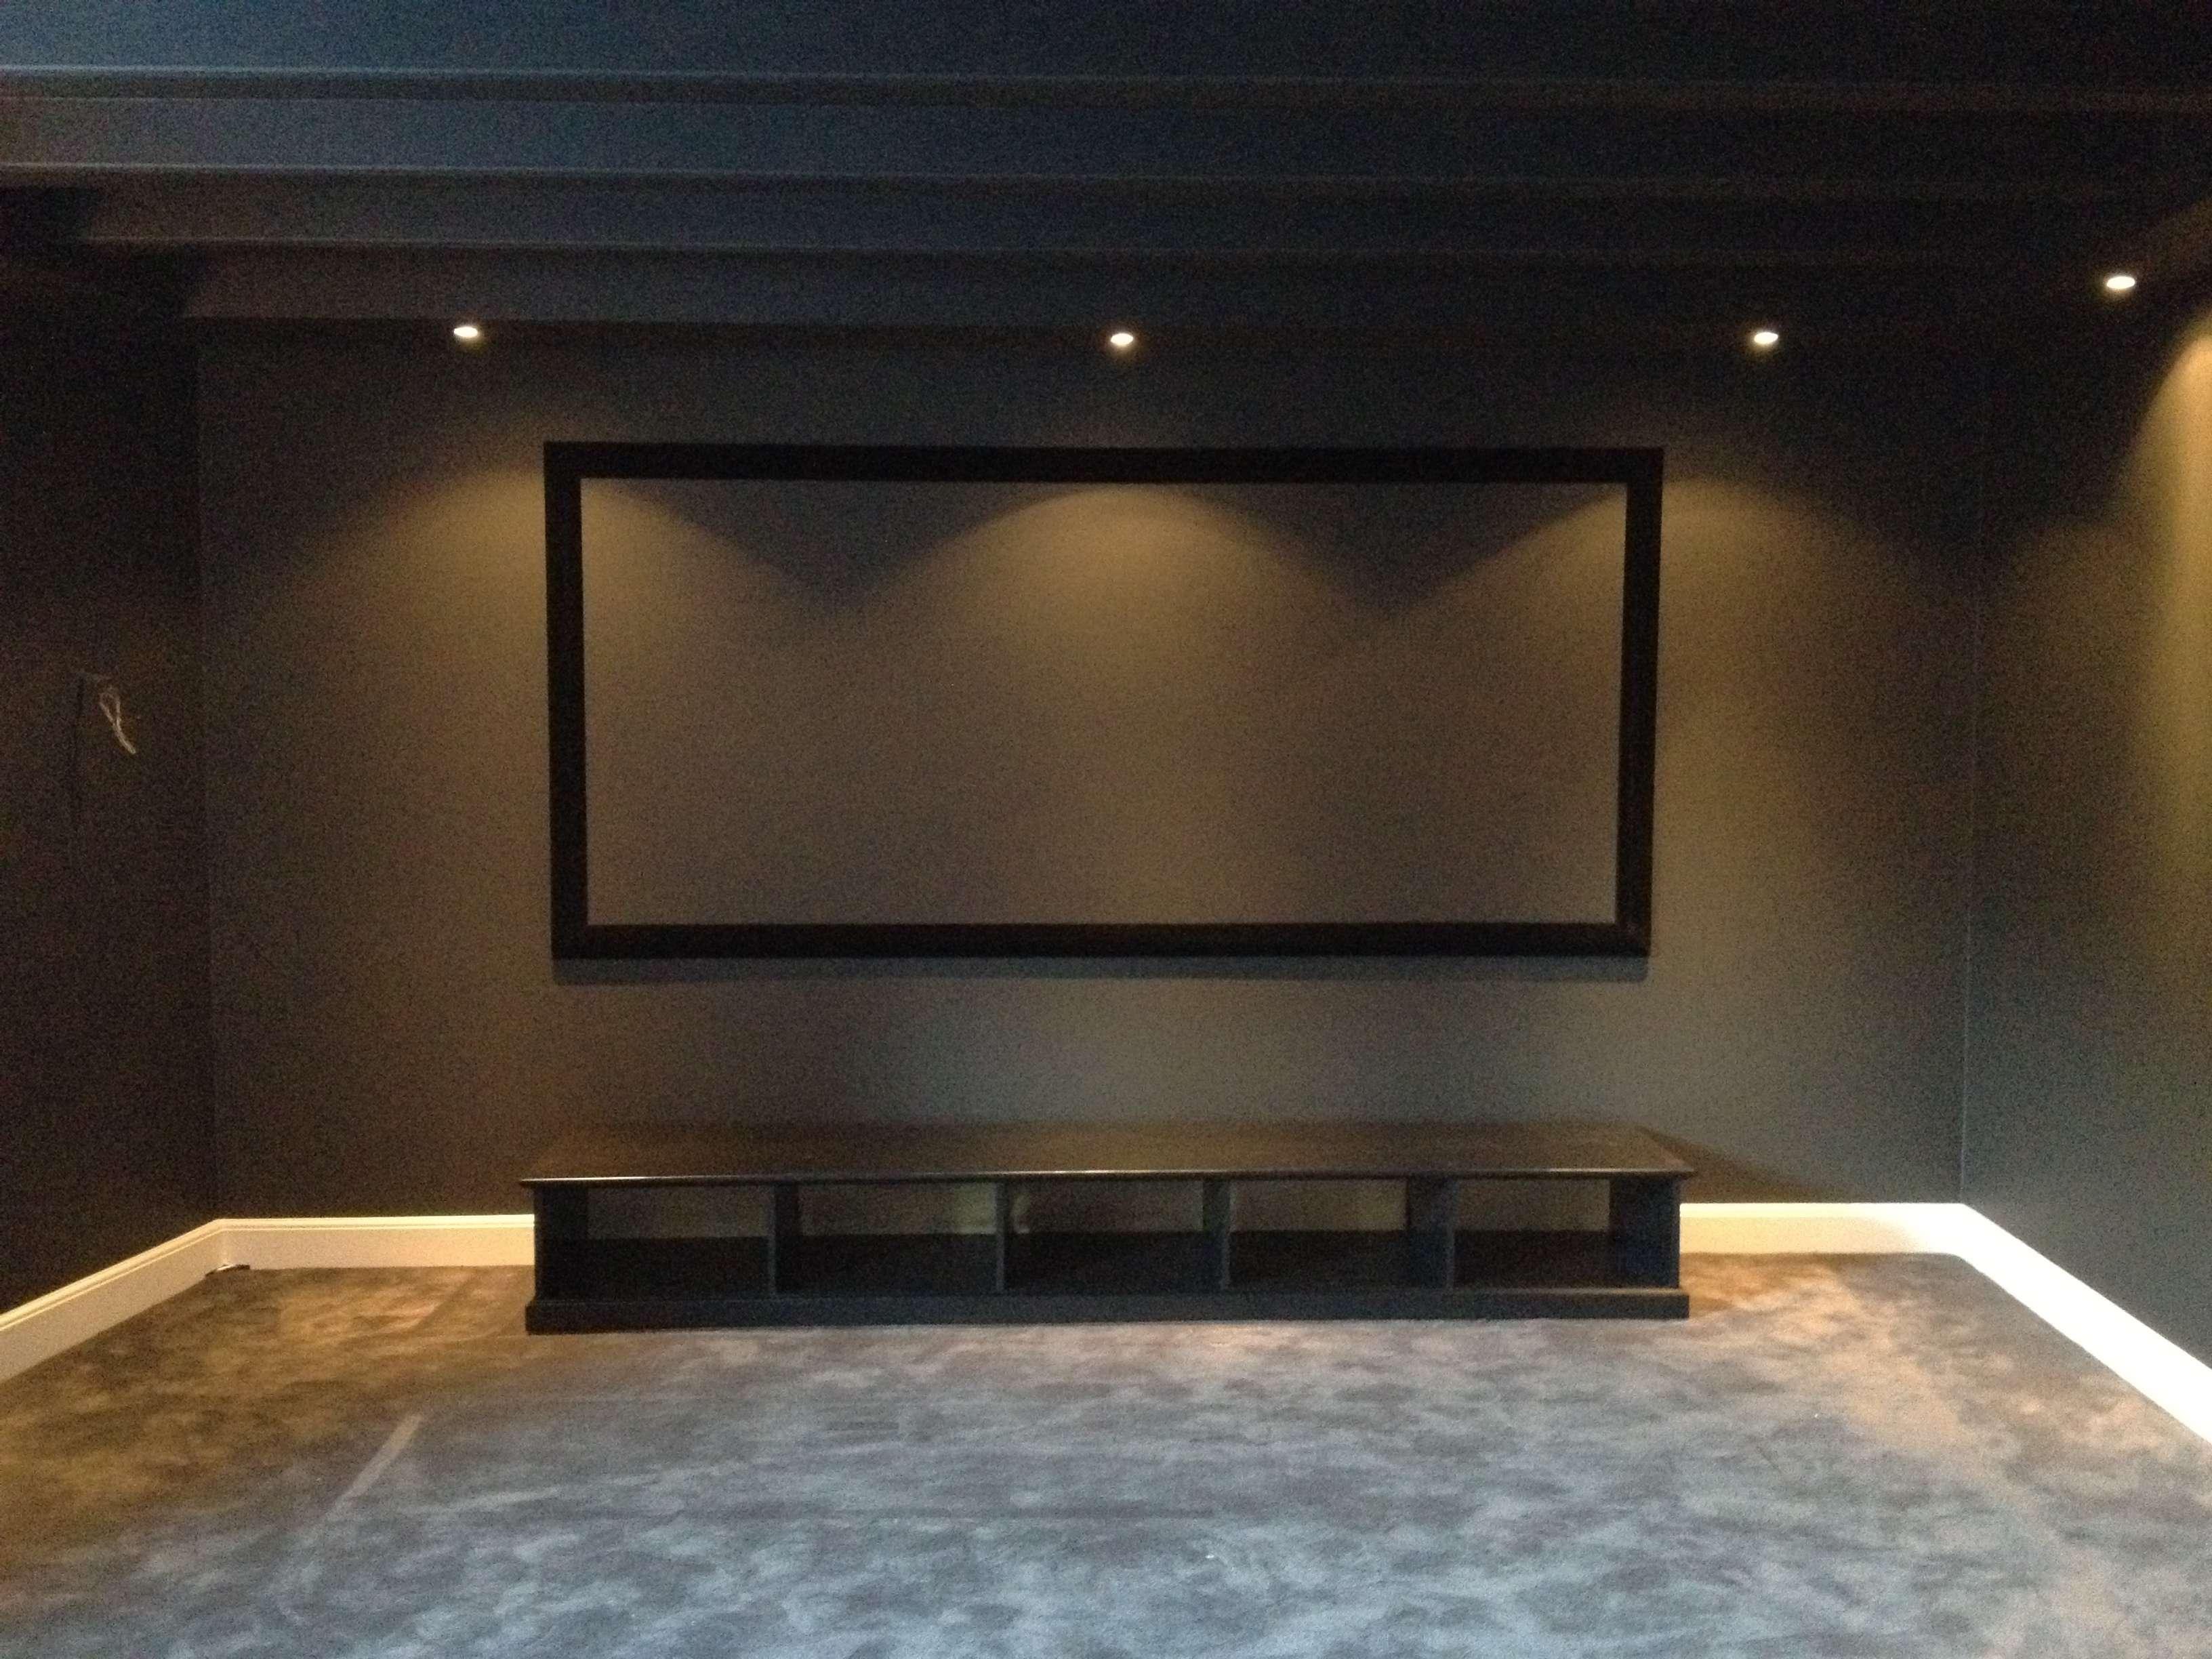 The cinemalounge